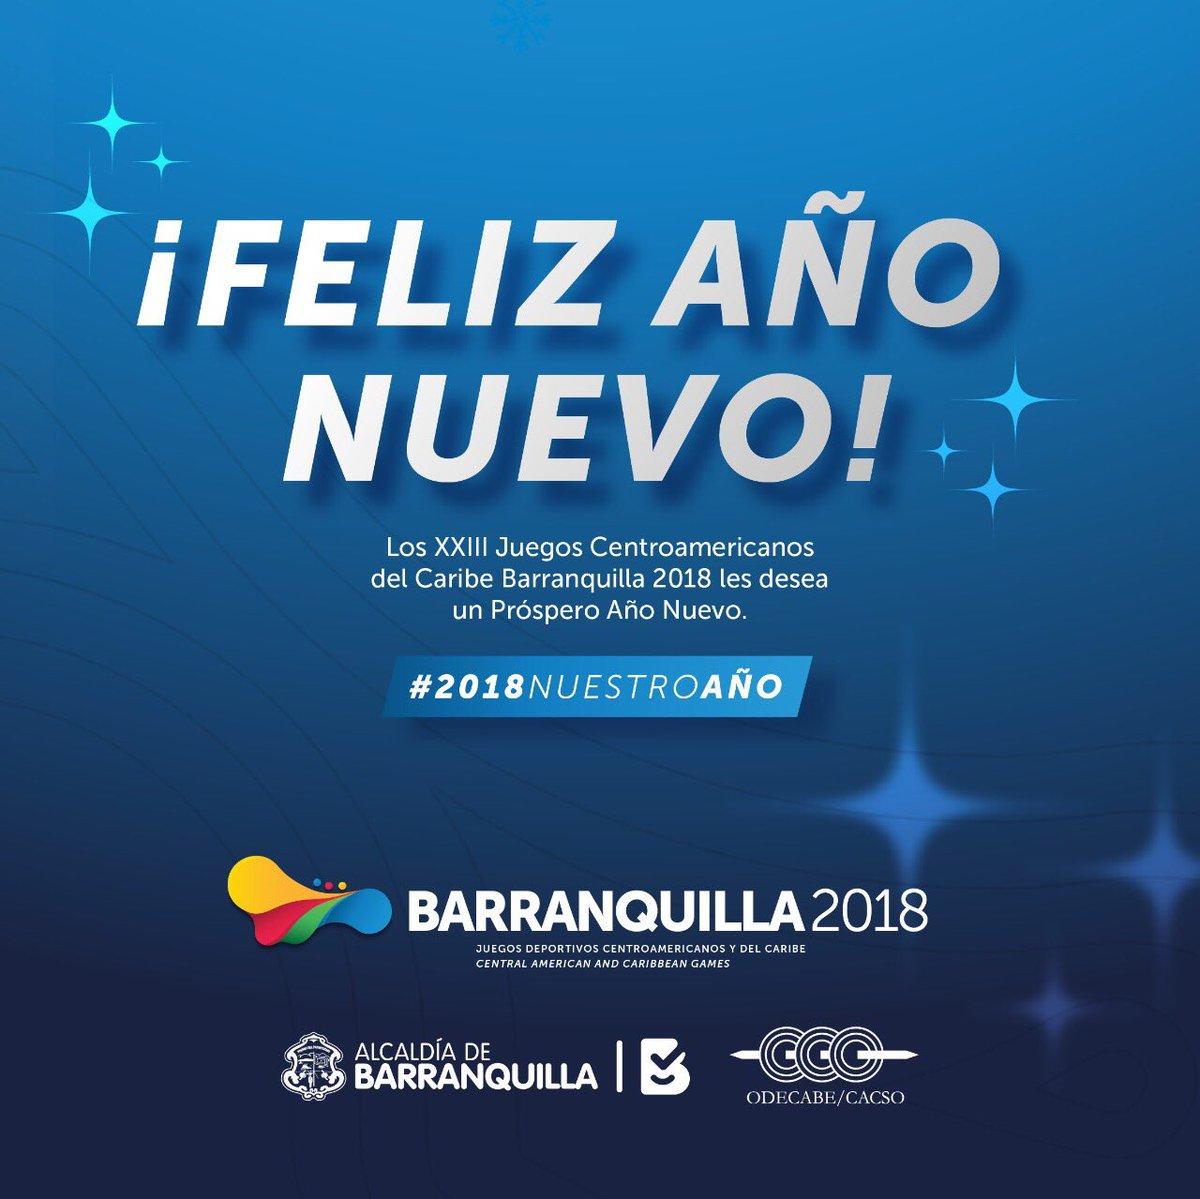 Barranquilla 2018 On Twitter El 2017 Ha Sido Un Gran Ano Hemos